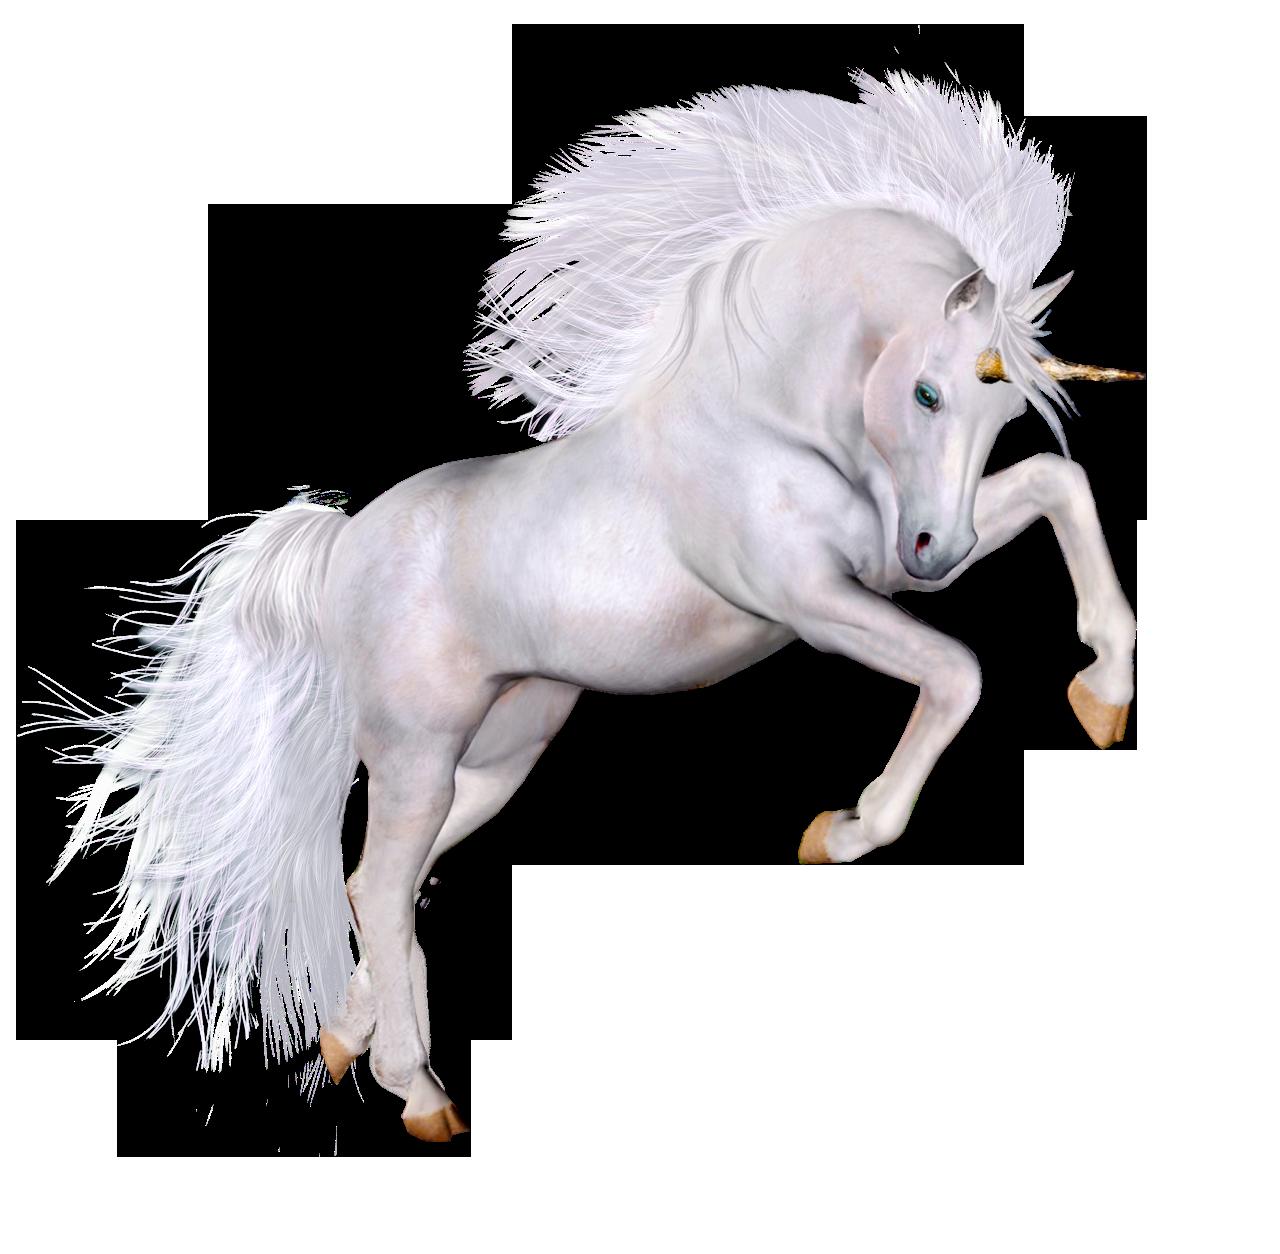 Beautifu d gallery yopriceville. Clipart unicorn high resolution